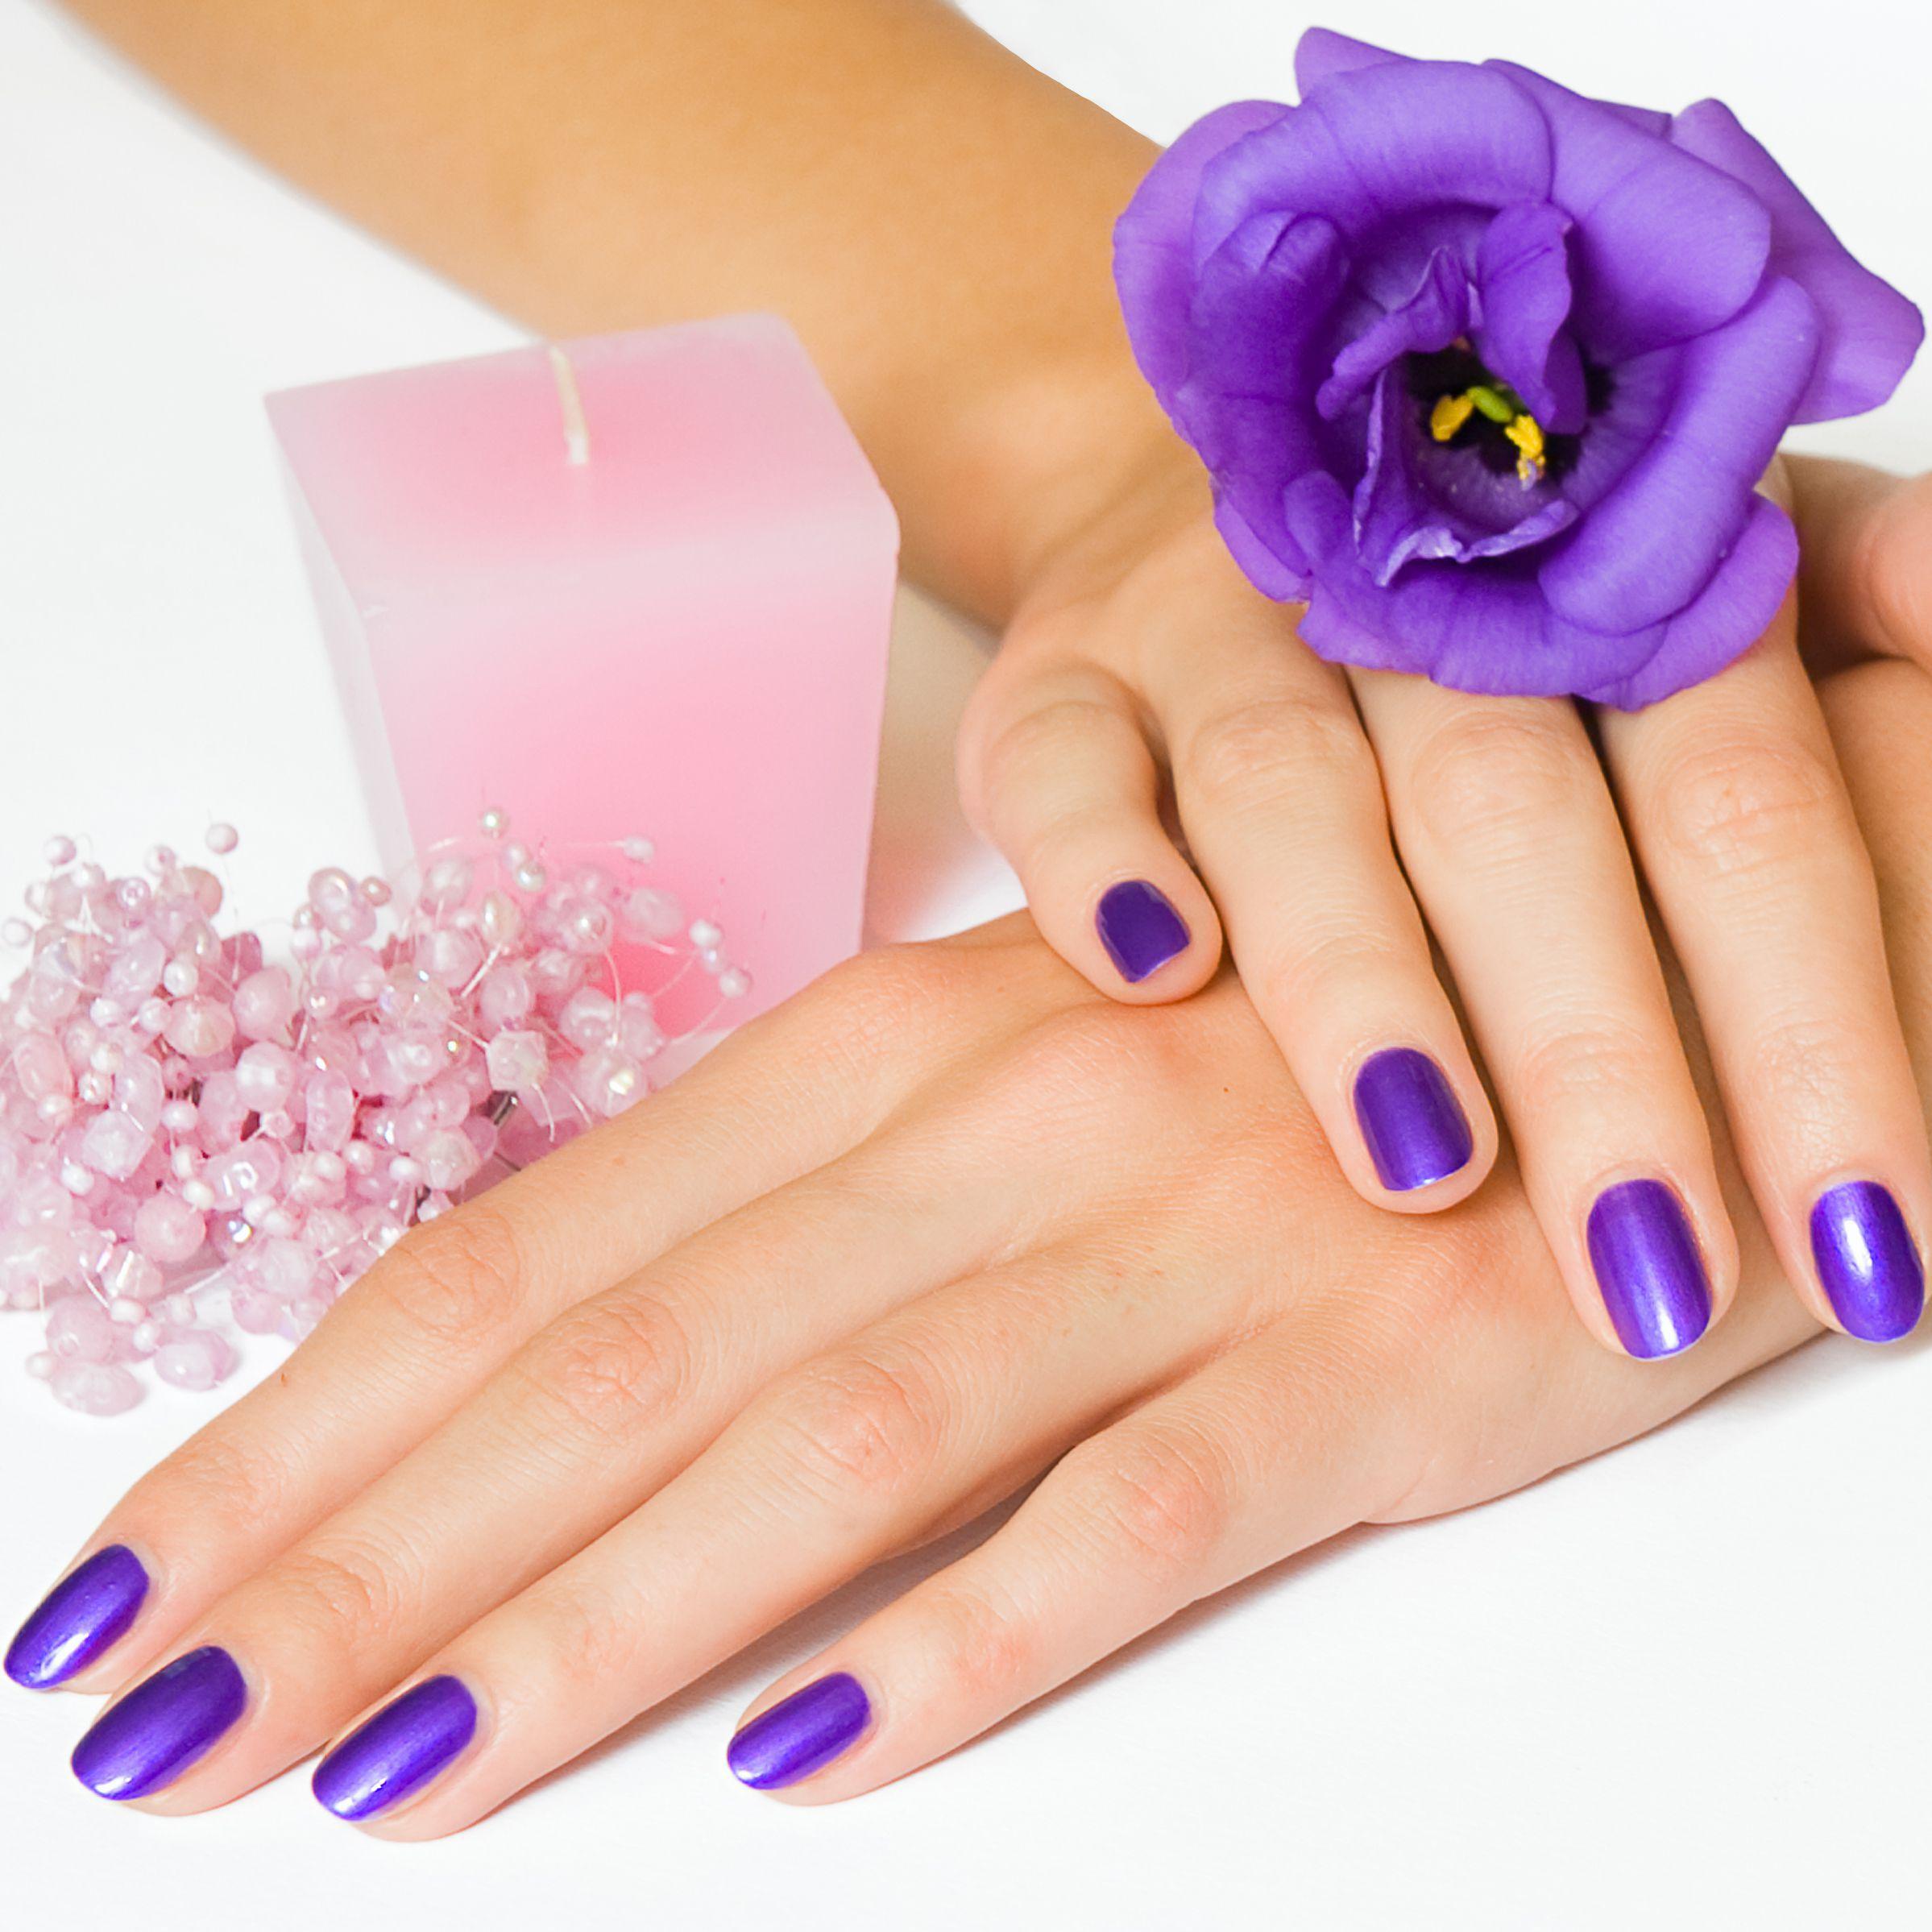 Nails Enhancements